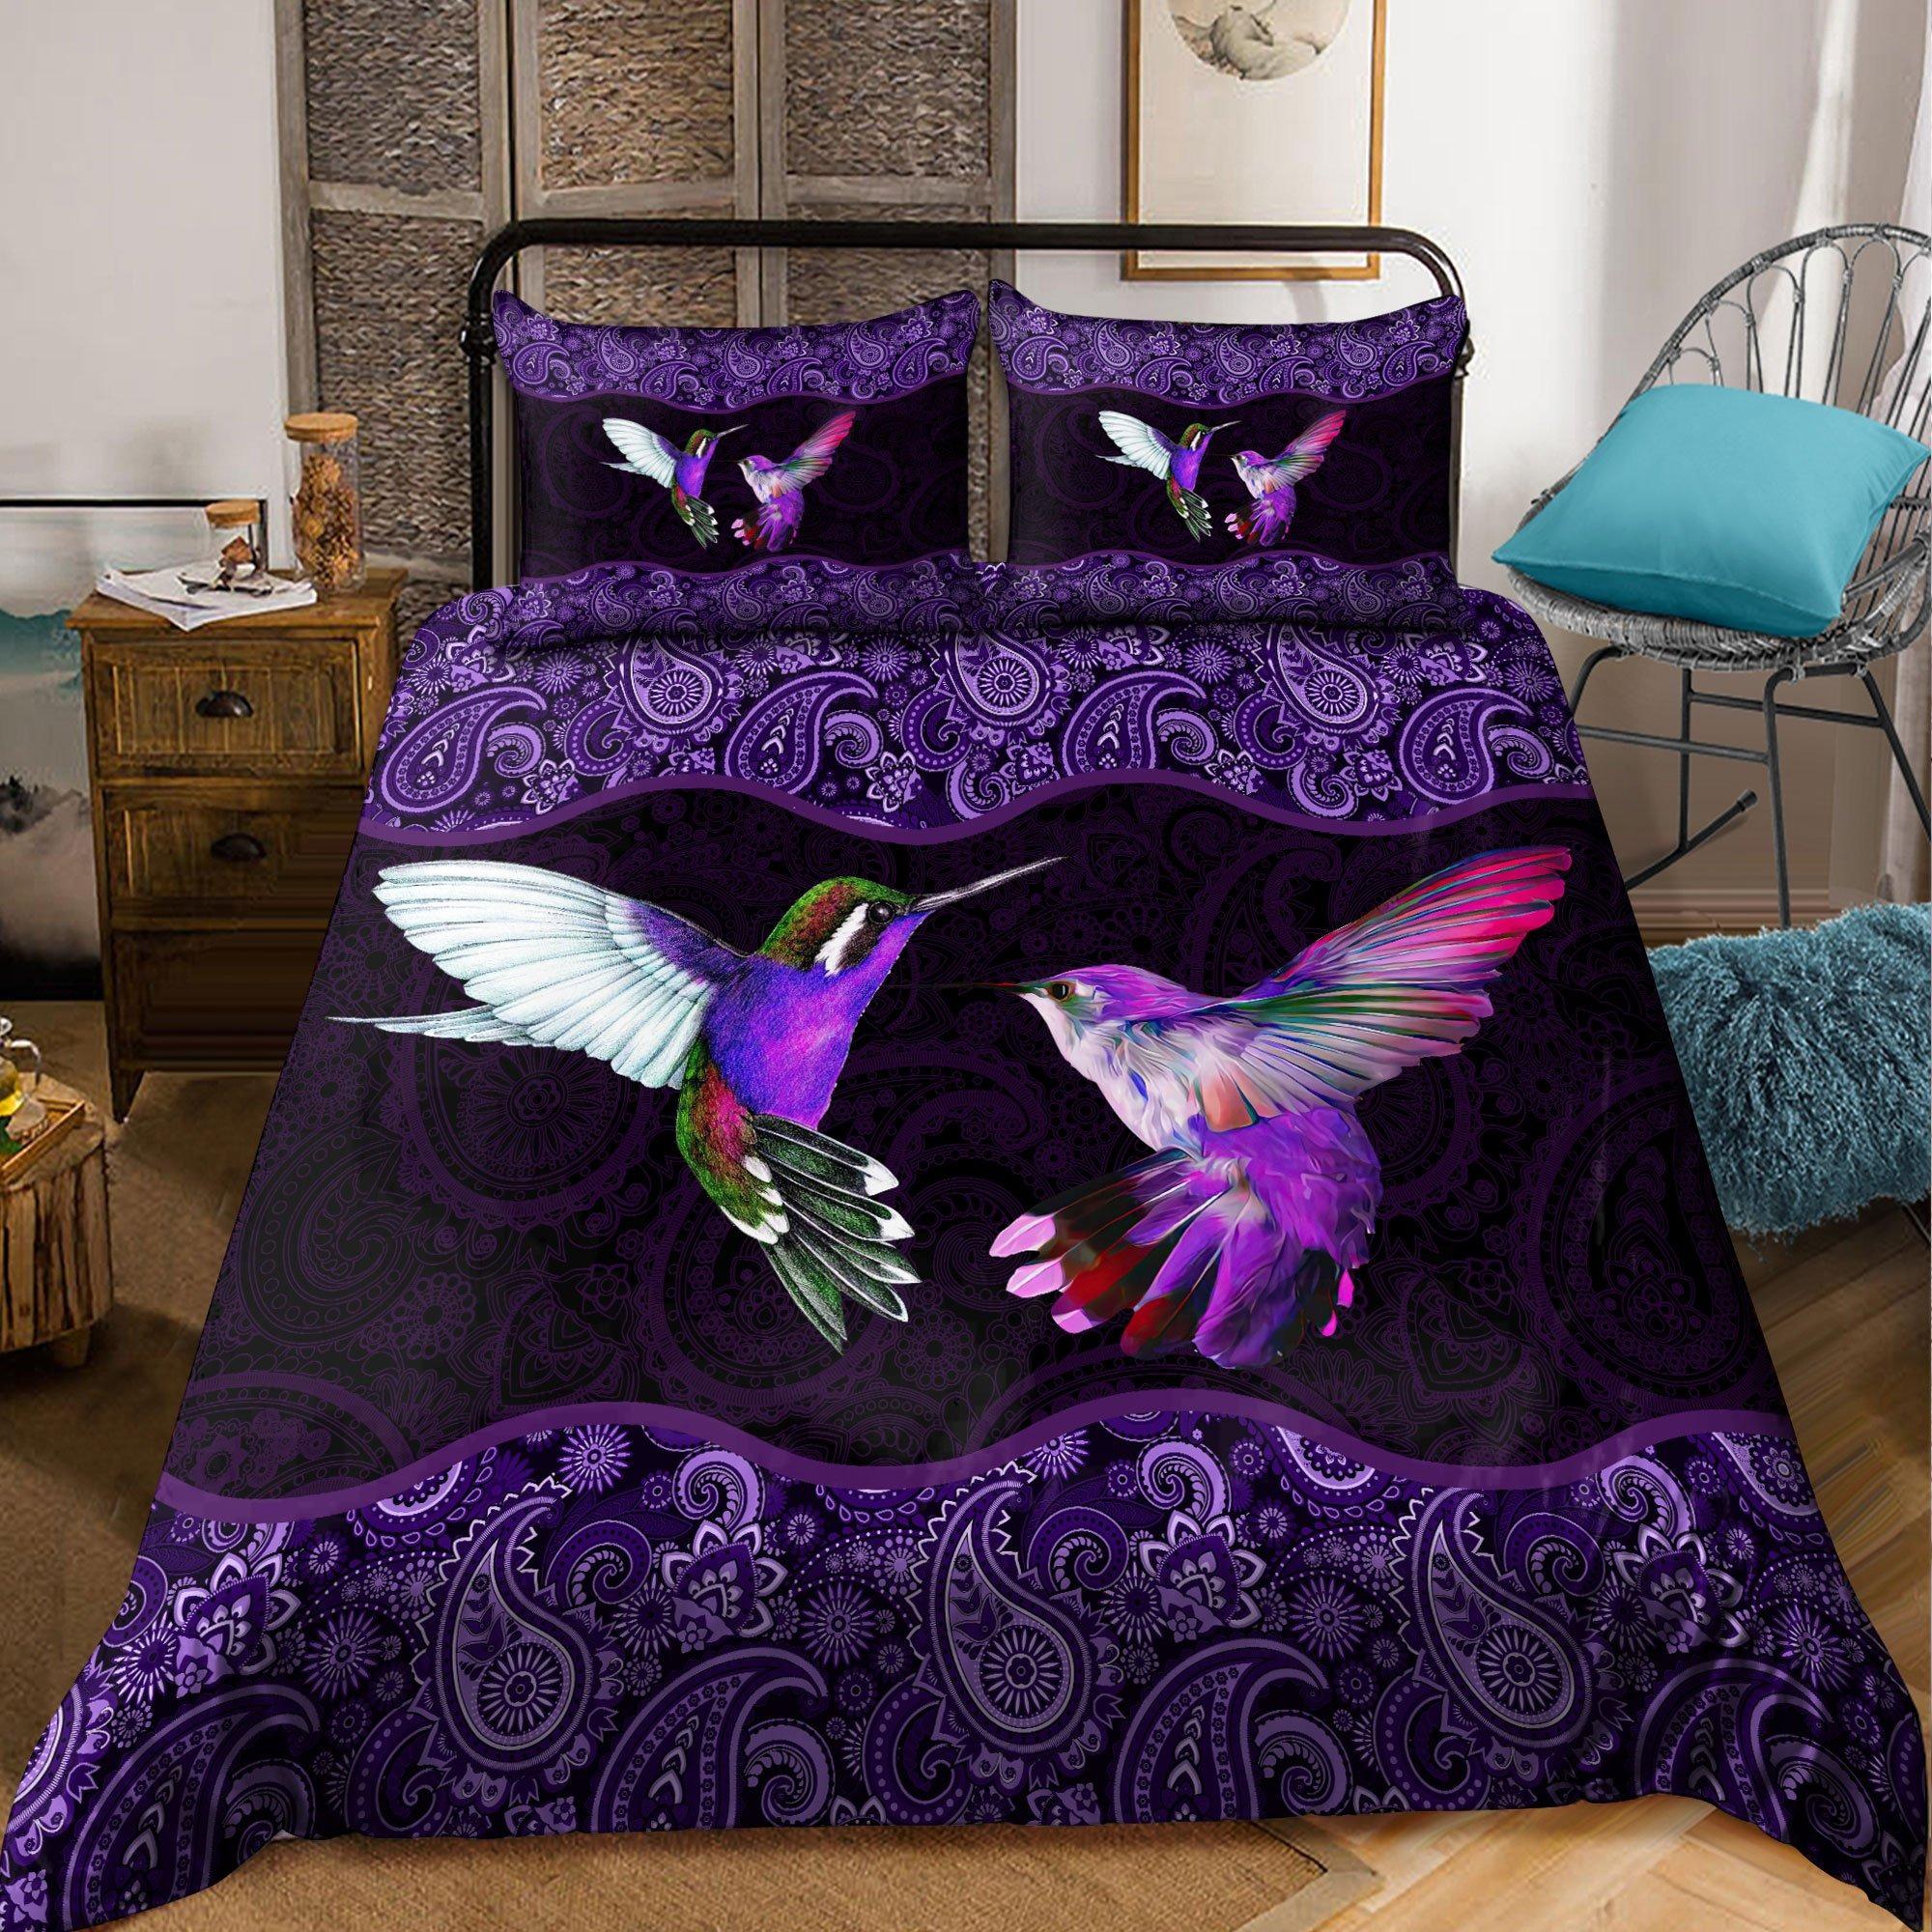 Hummingbird mandala bedding set